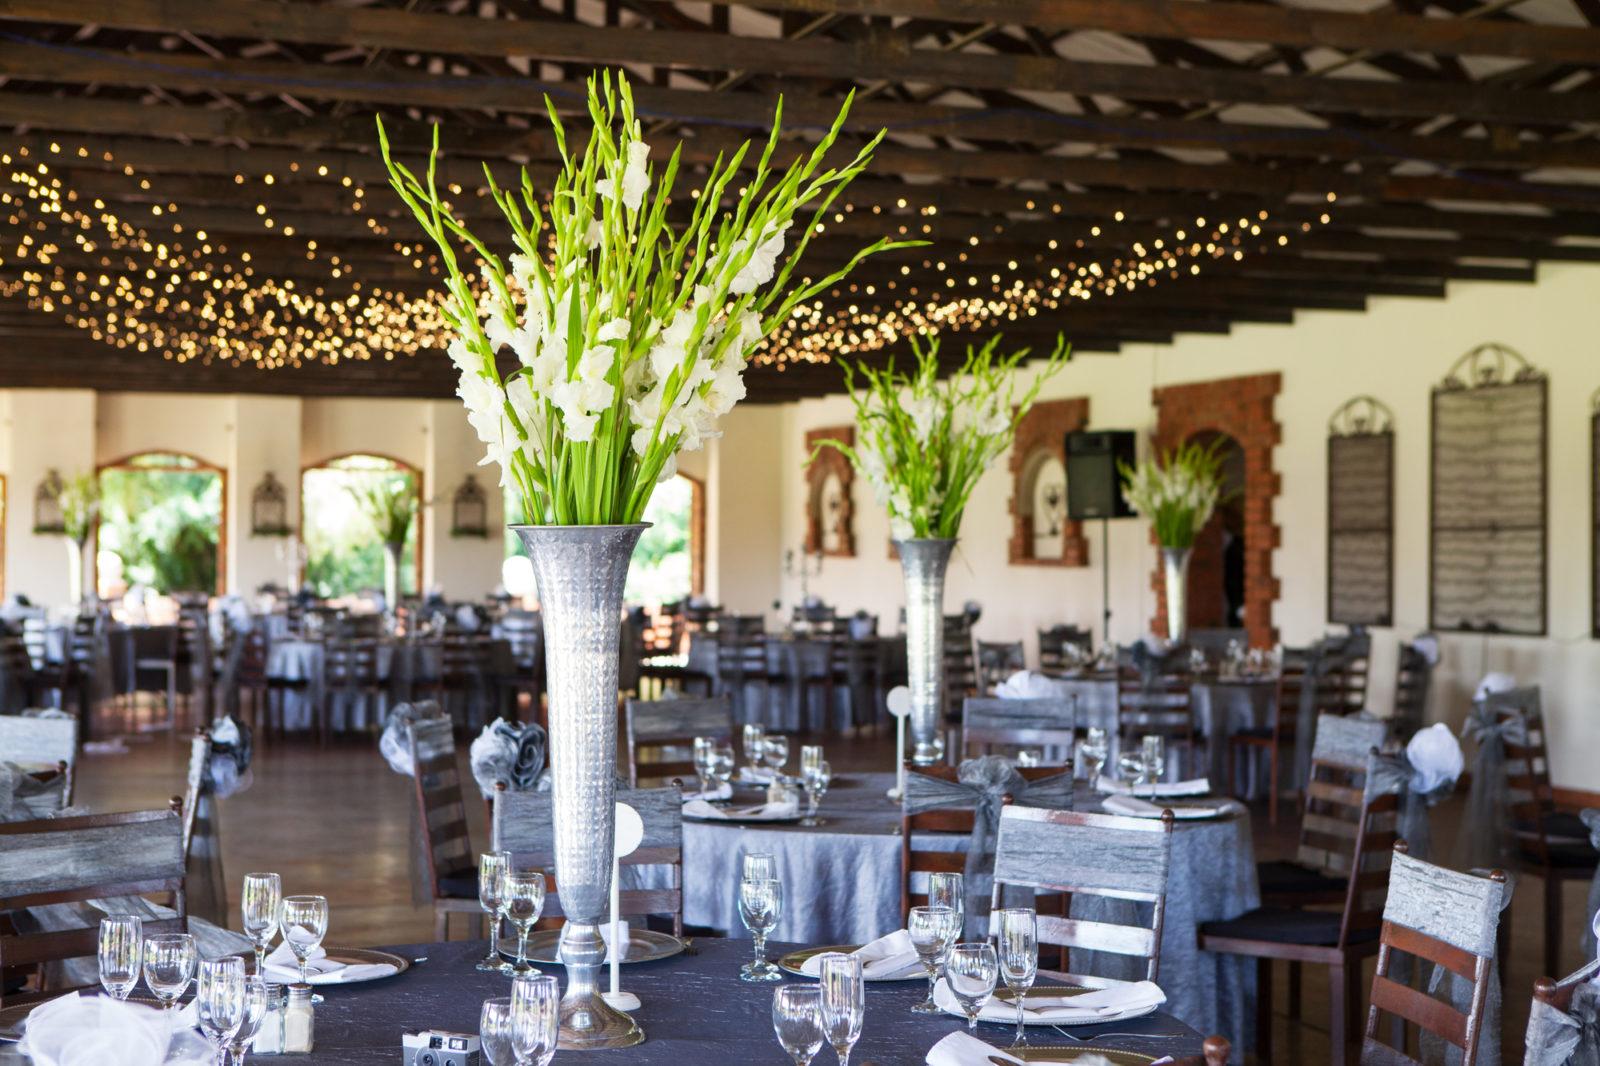 designing effective event lighting concepts national event pros